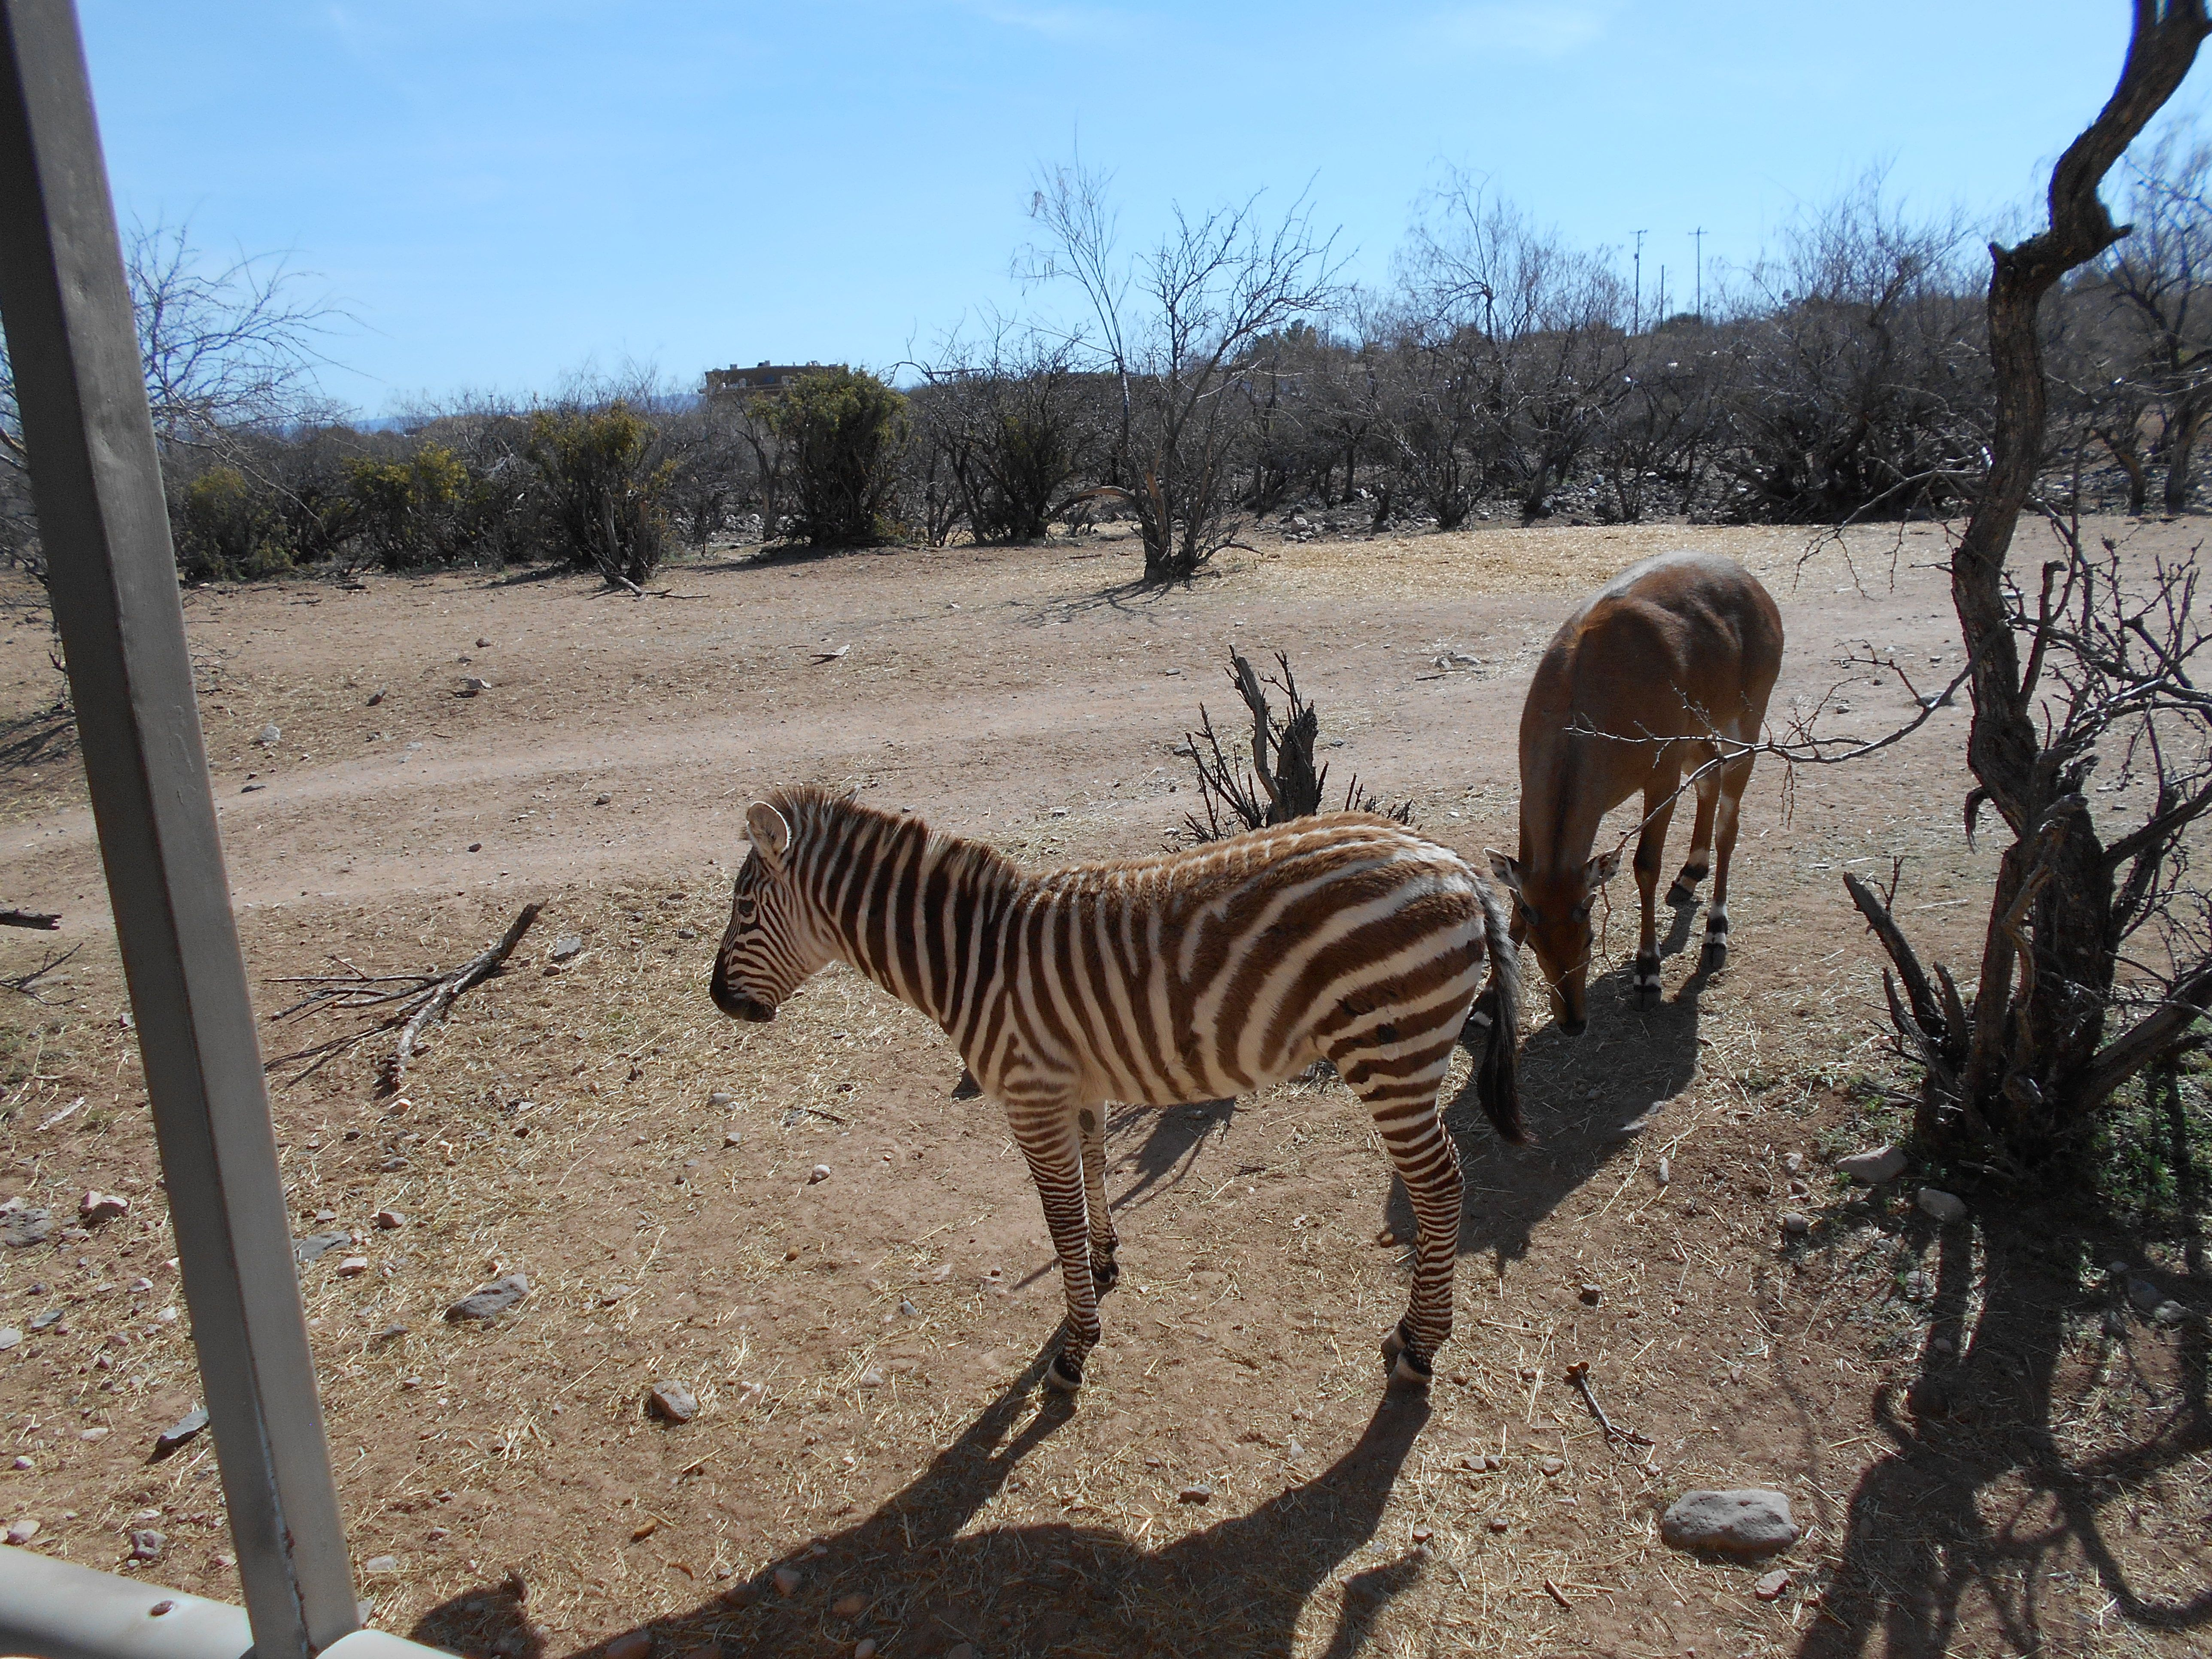 Young zebra | Zebra, Animals